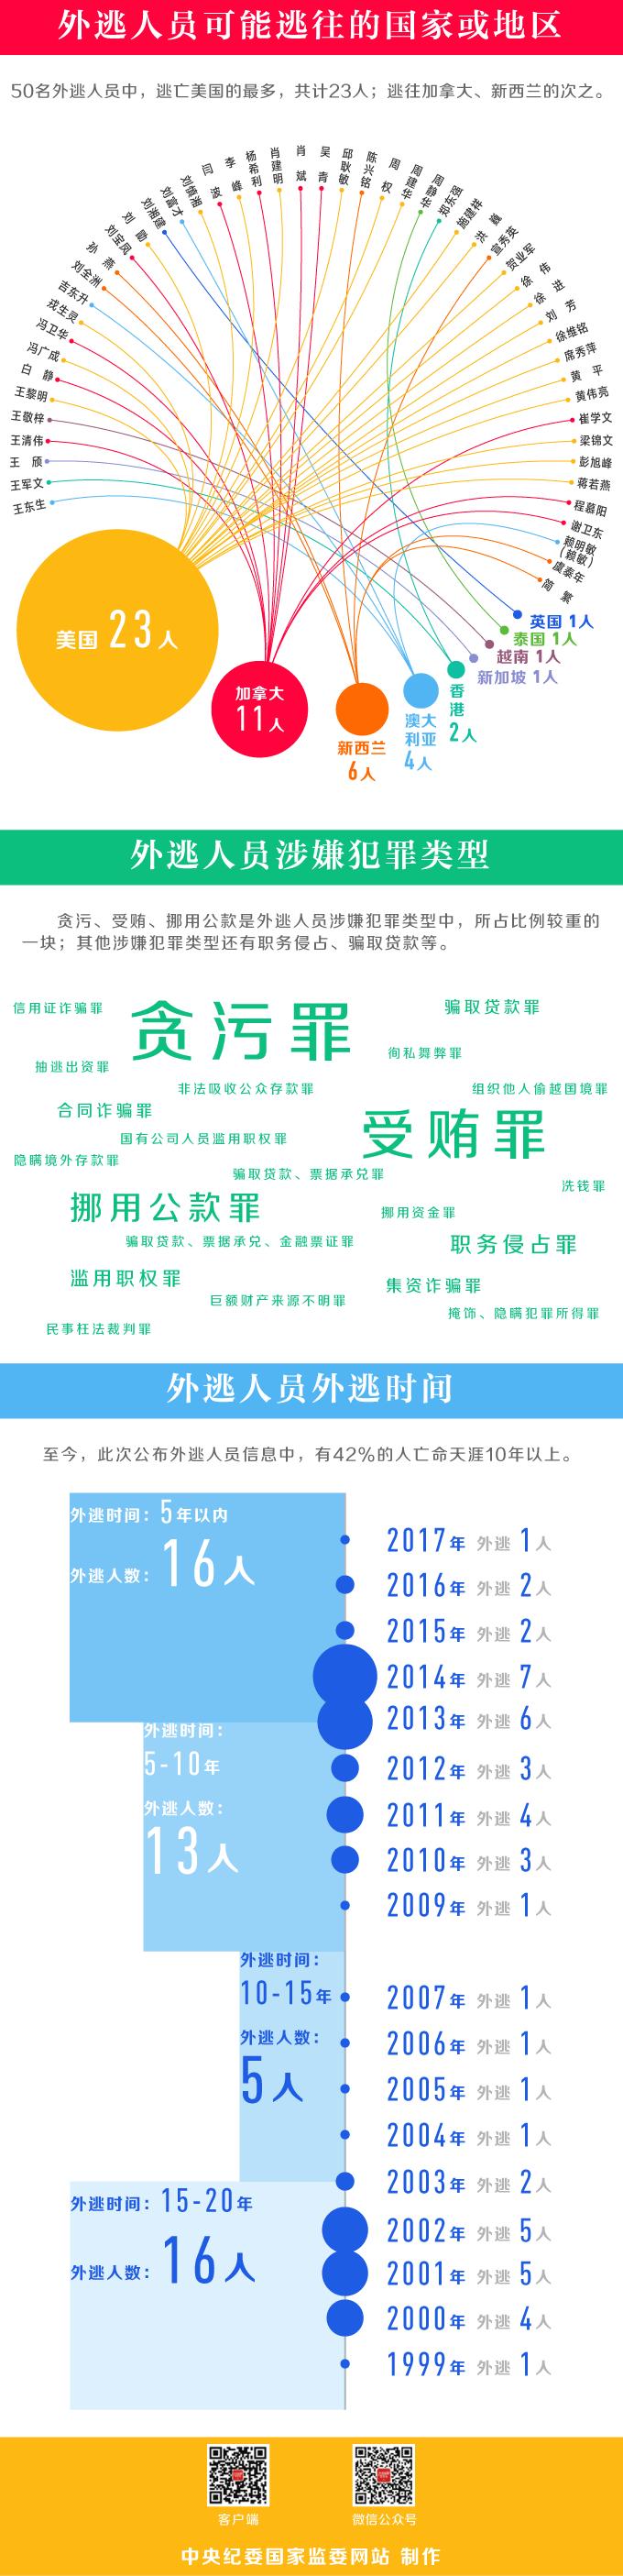 QQ图片20180606194702.png